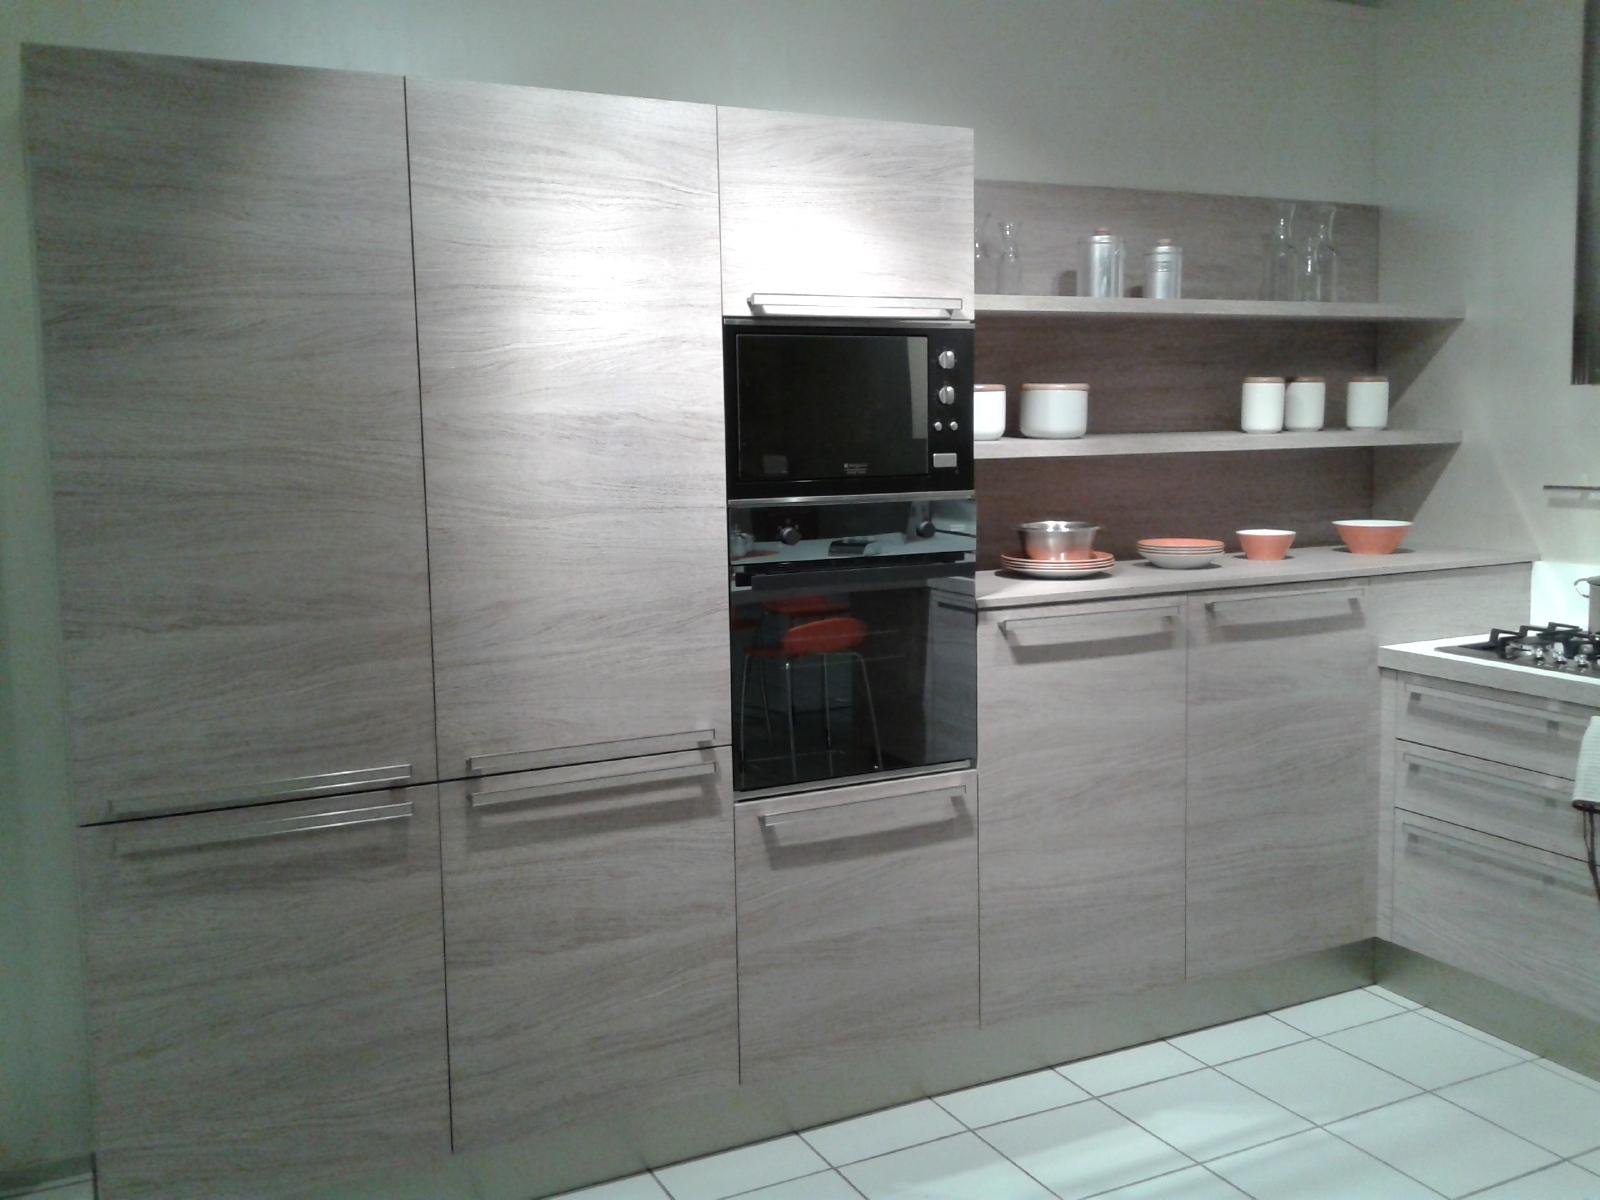 Cucina Veneta Cucine Ethica Decorativo Laminato Materico Cucine A  #785B53 1600 1200 Rivenditori Cucine Veneta